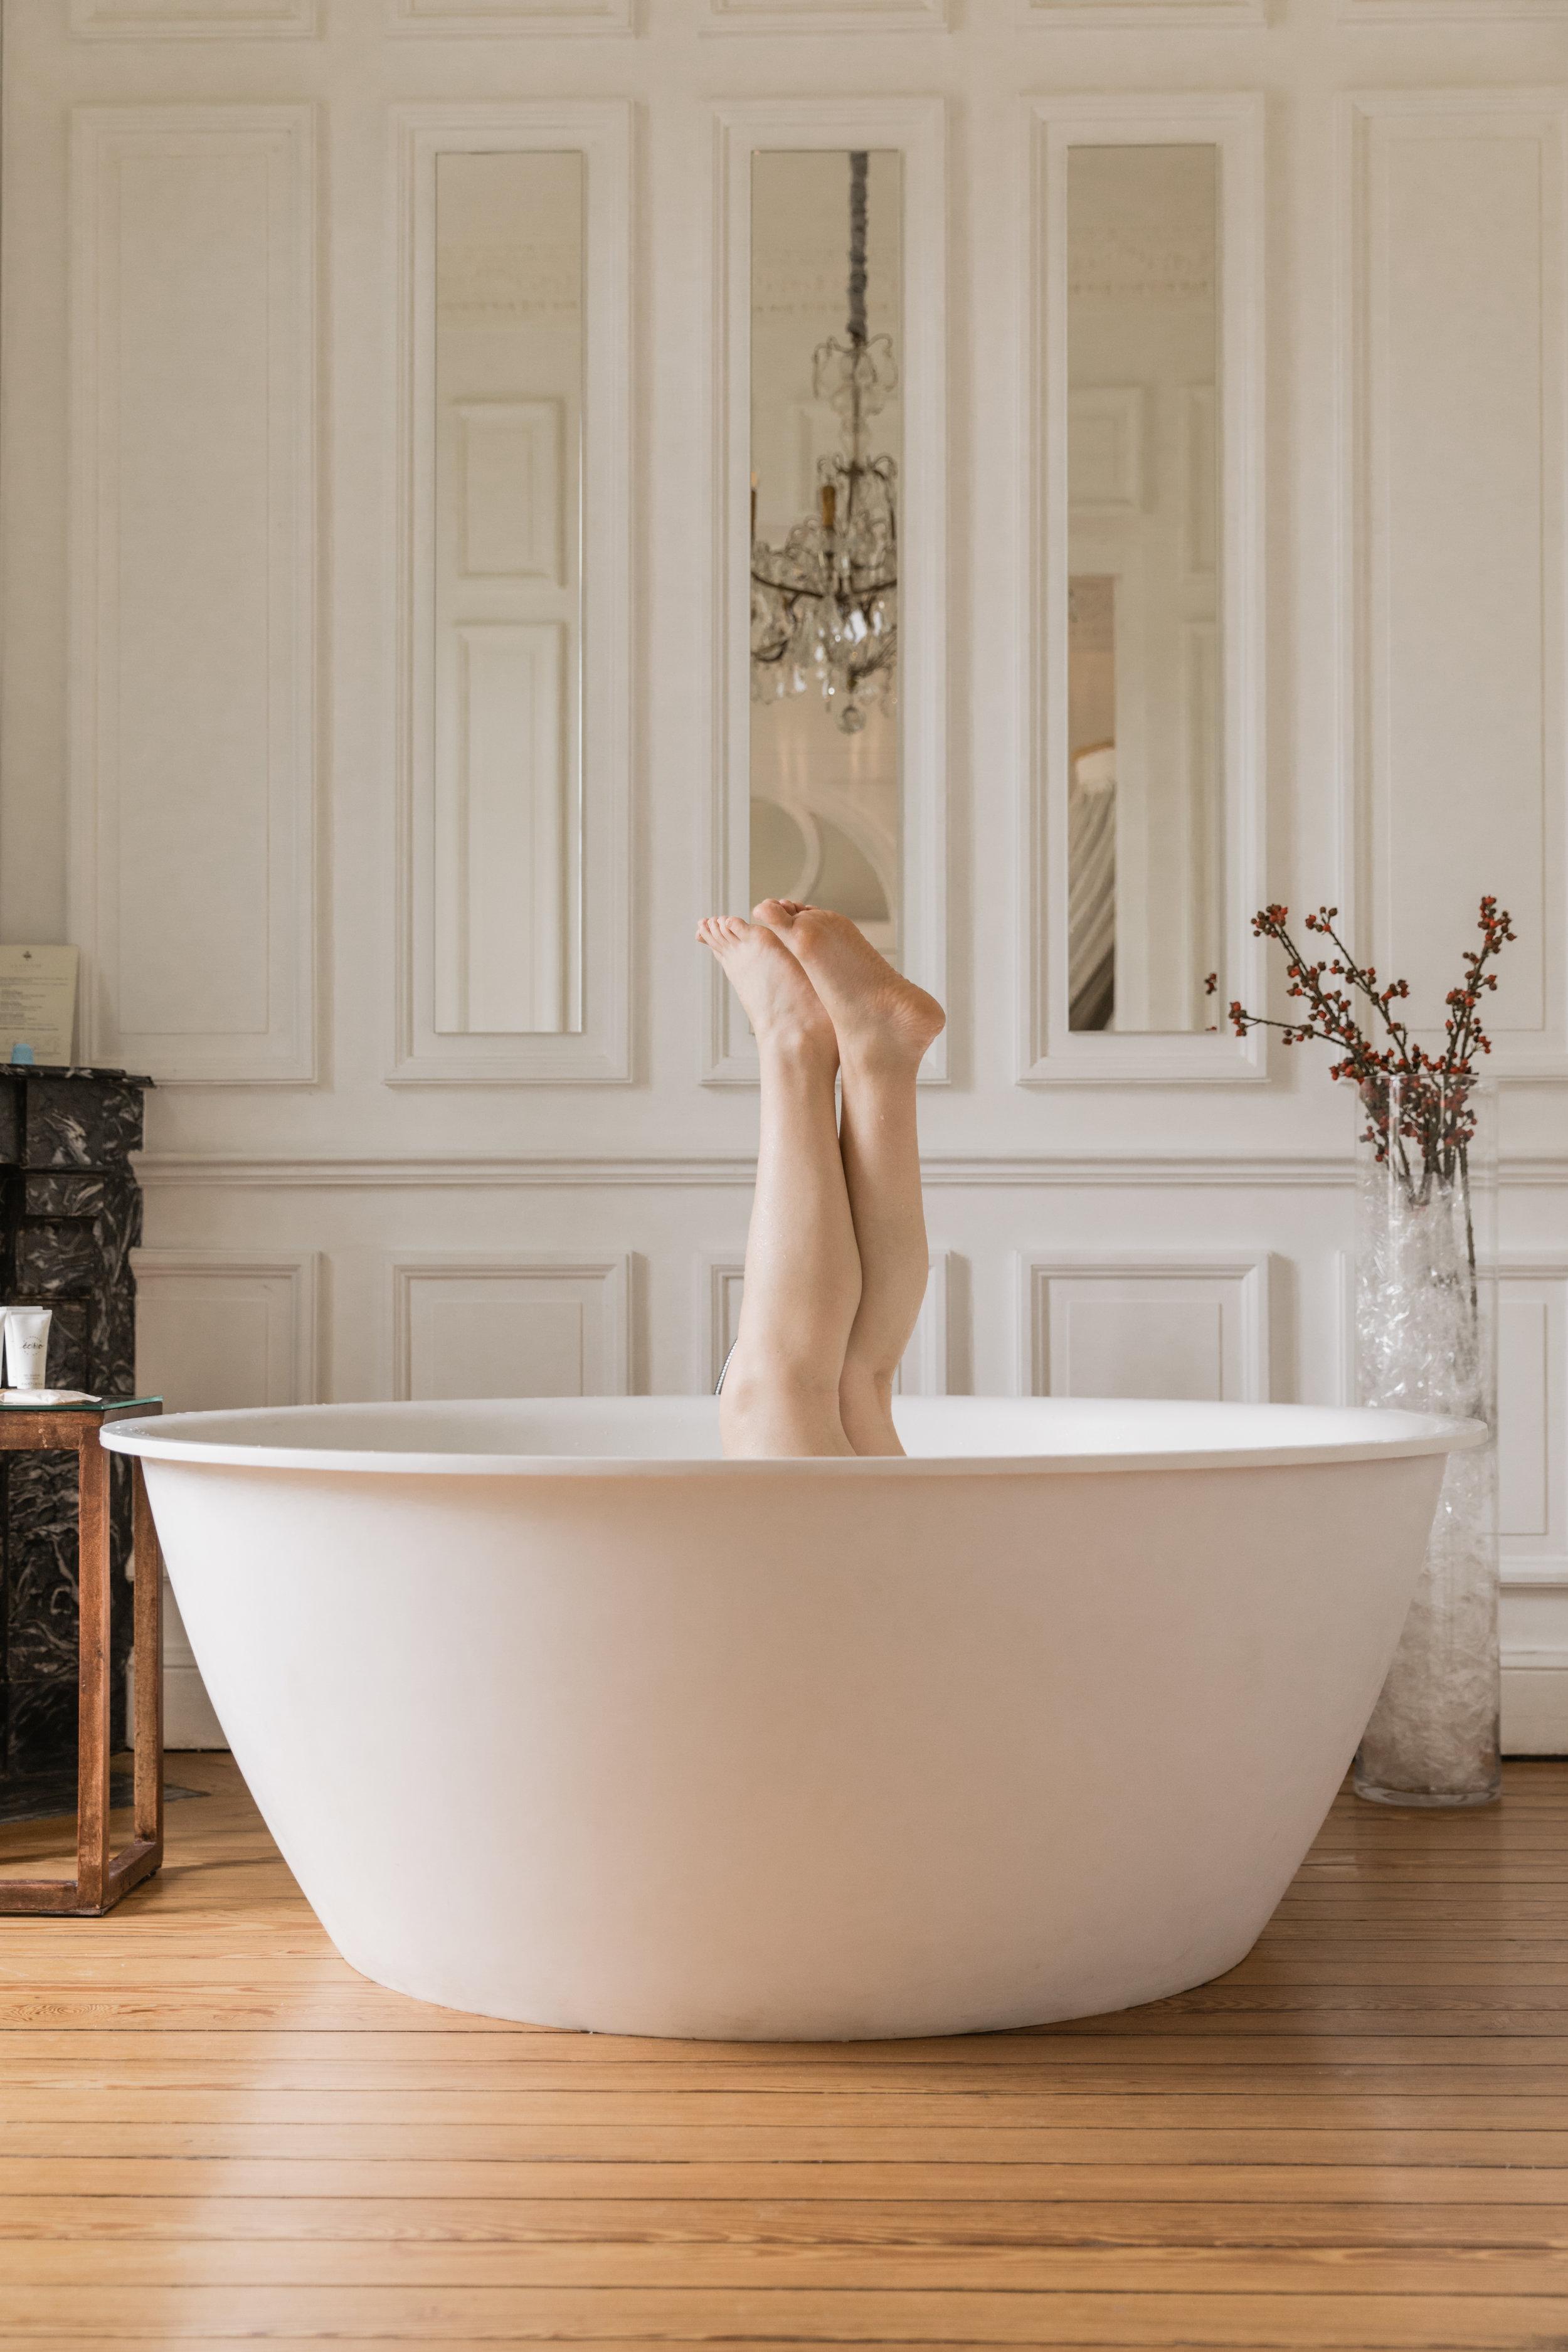 Marie_bathtub-3.JPG